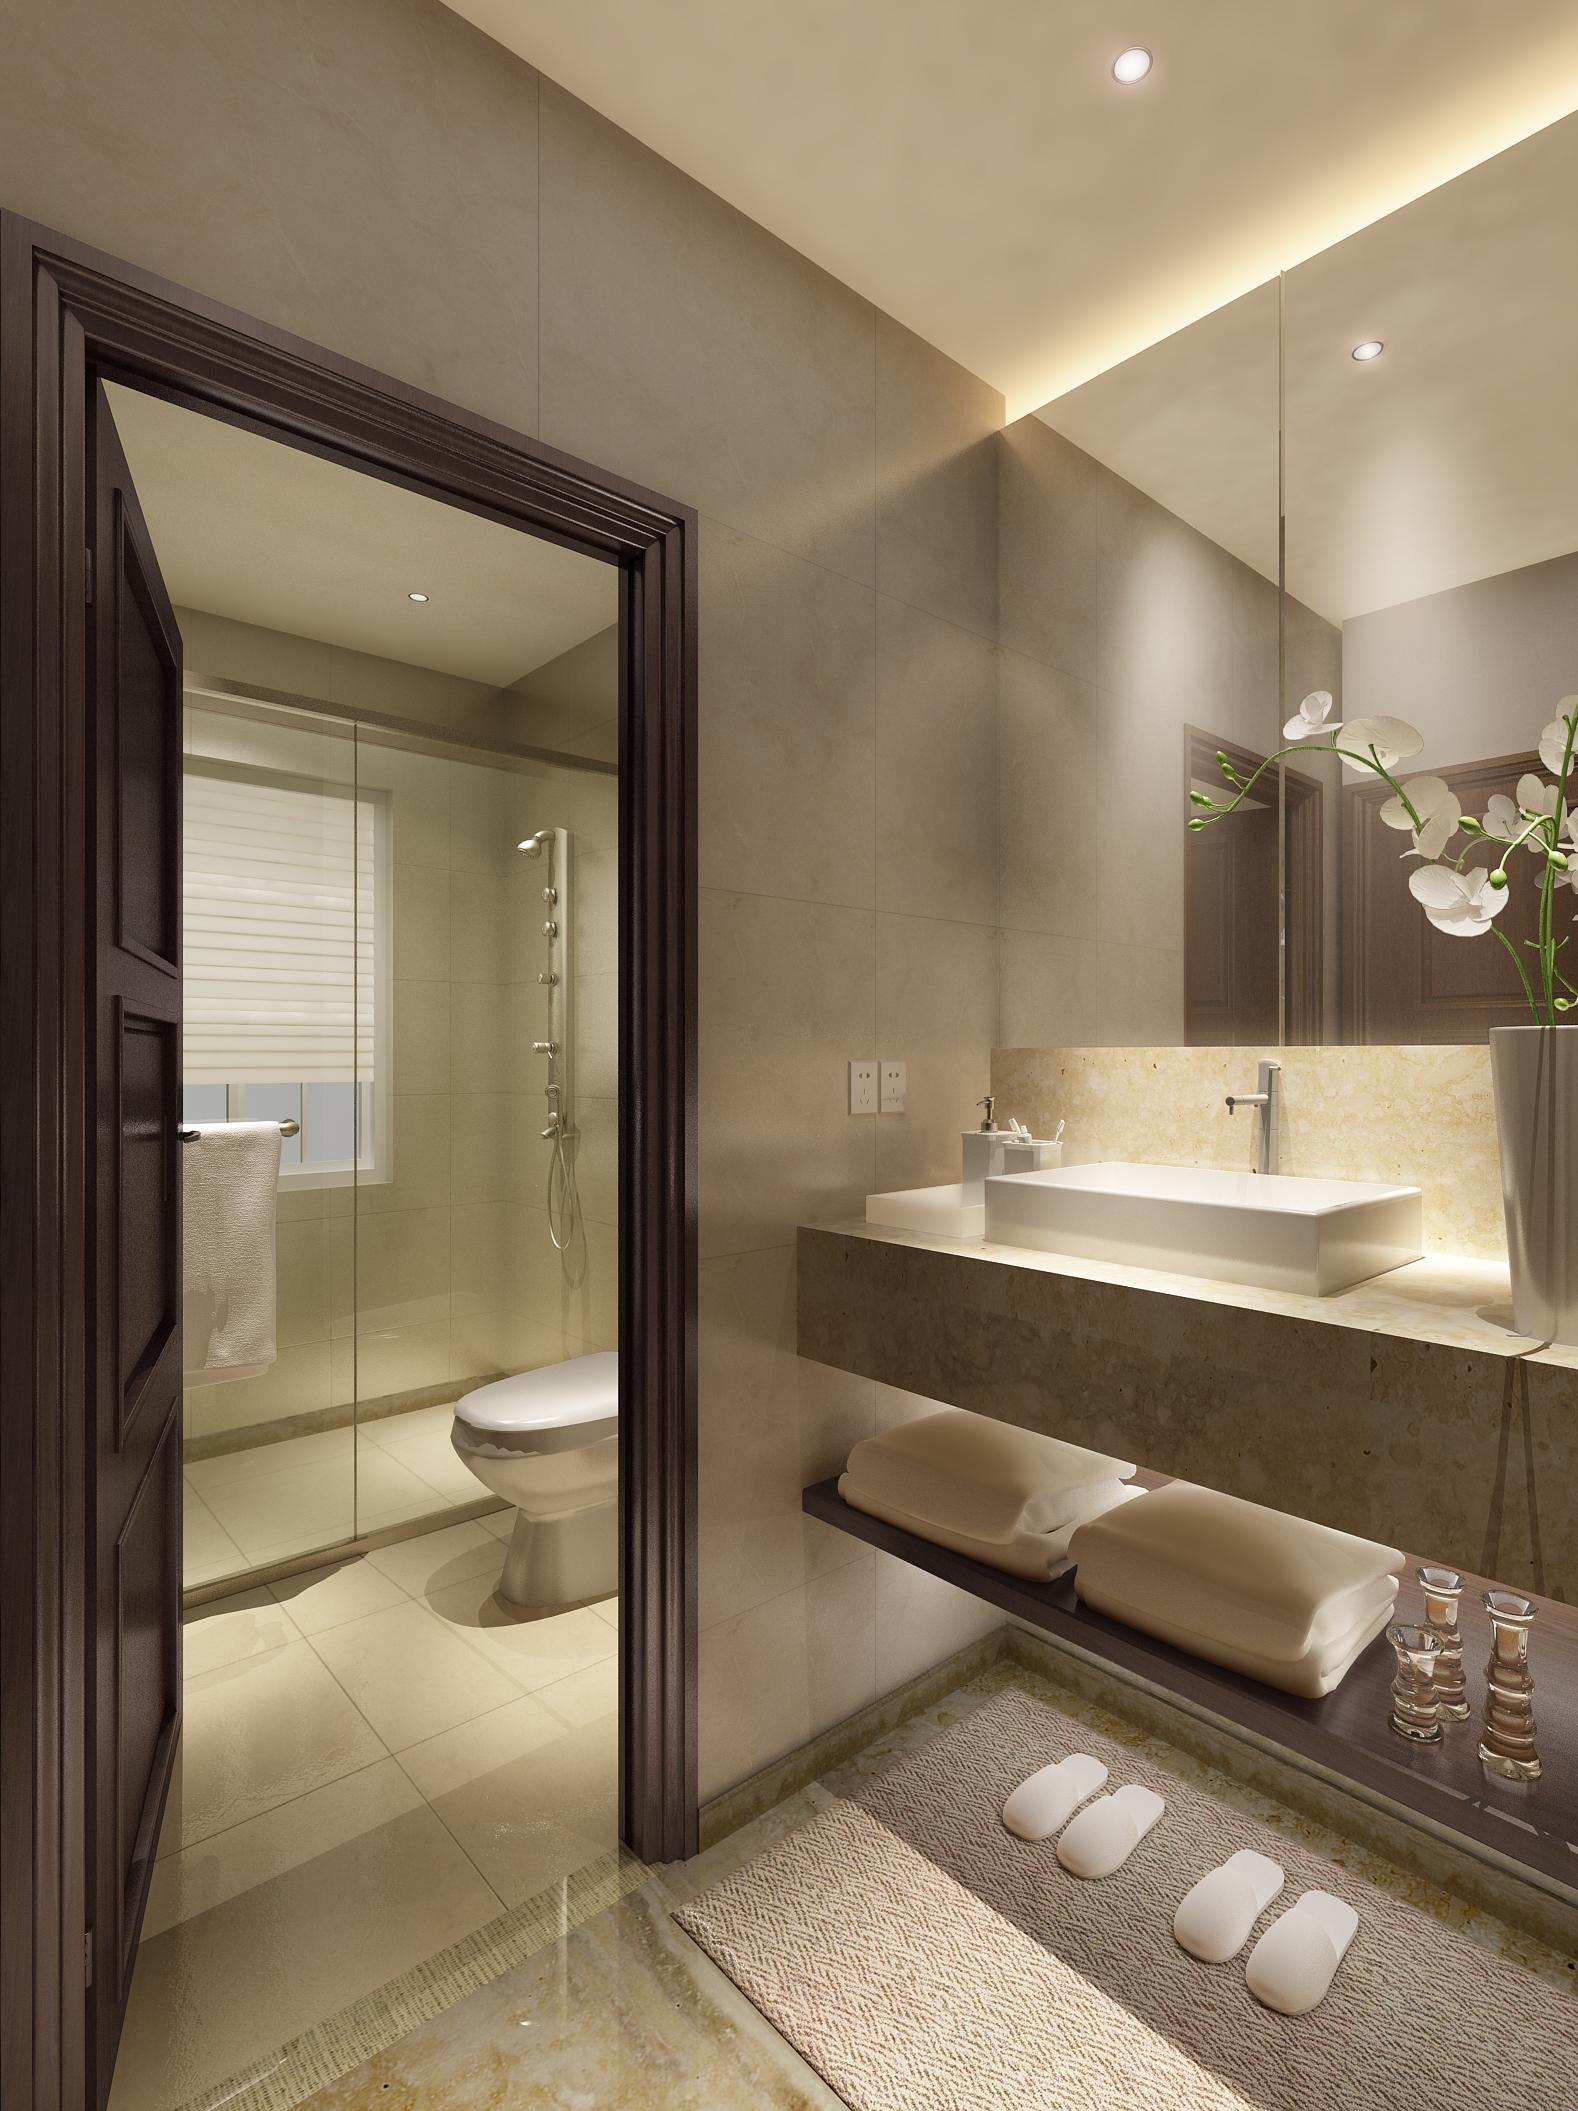 Luxurious Bathroom With Marble Floor 3D Model .max ... on Model Bathroom  id=41310